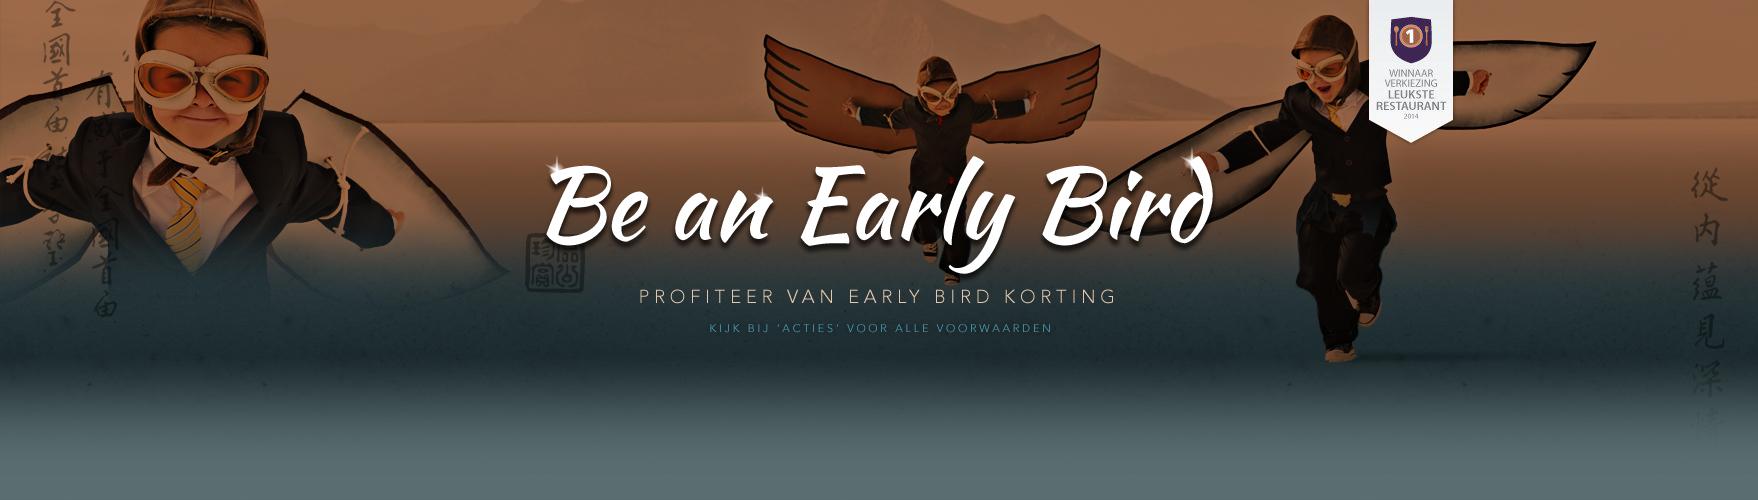 earlybirdwhite